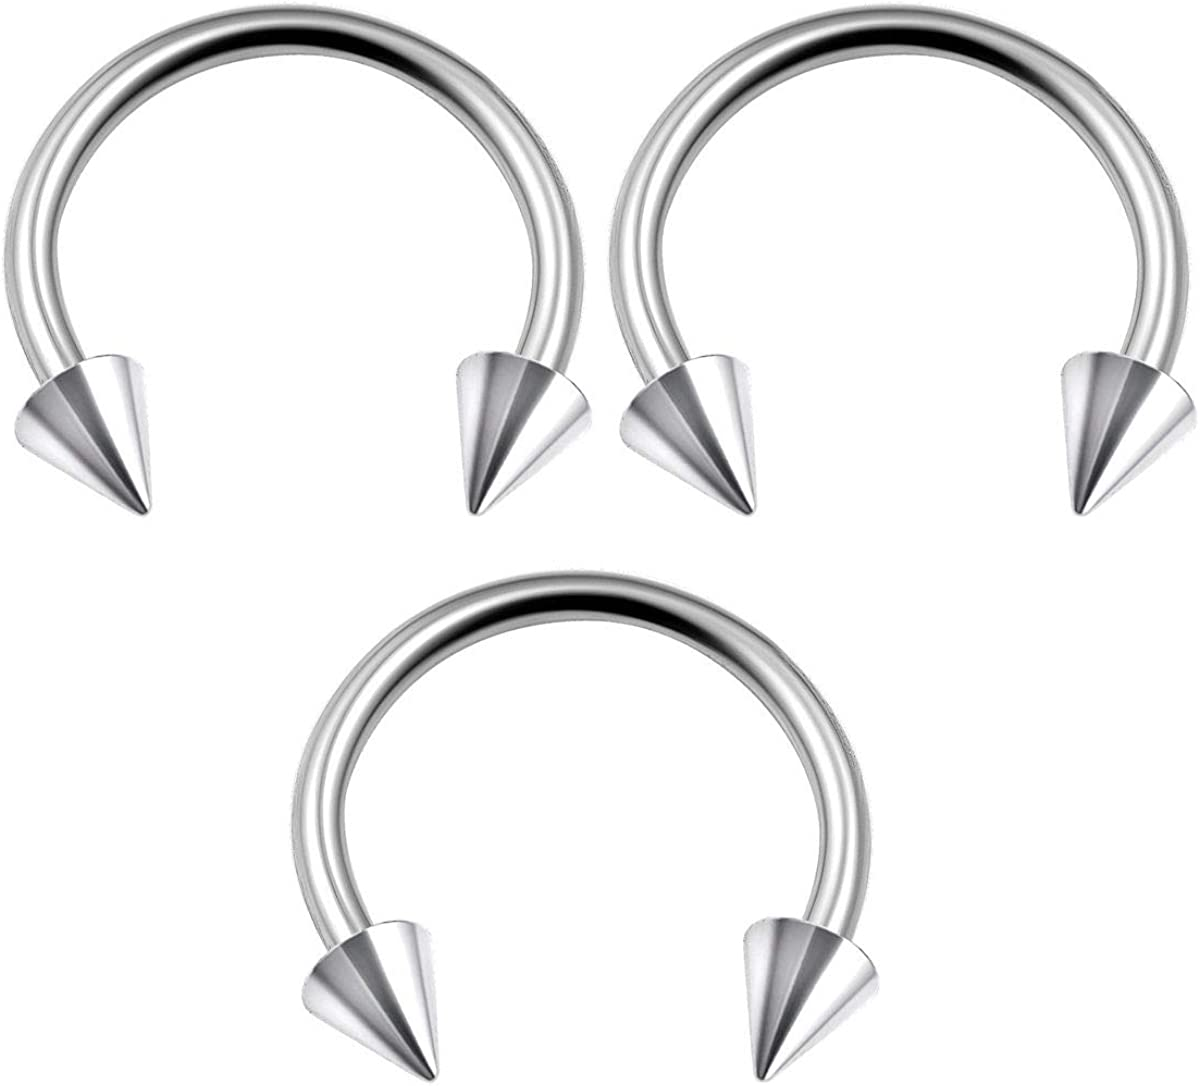 BanaVega 3PCS Surgical Steel Circular Barbell 16g 3mm Spike Cartilage Tragus Eyebrow Lip Earrings Septum Piercing Jewelry Choose Sizes